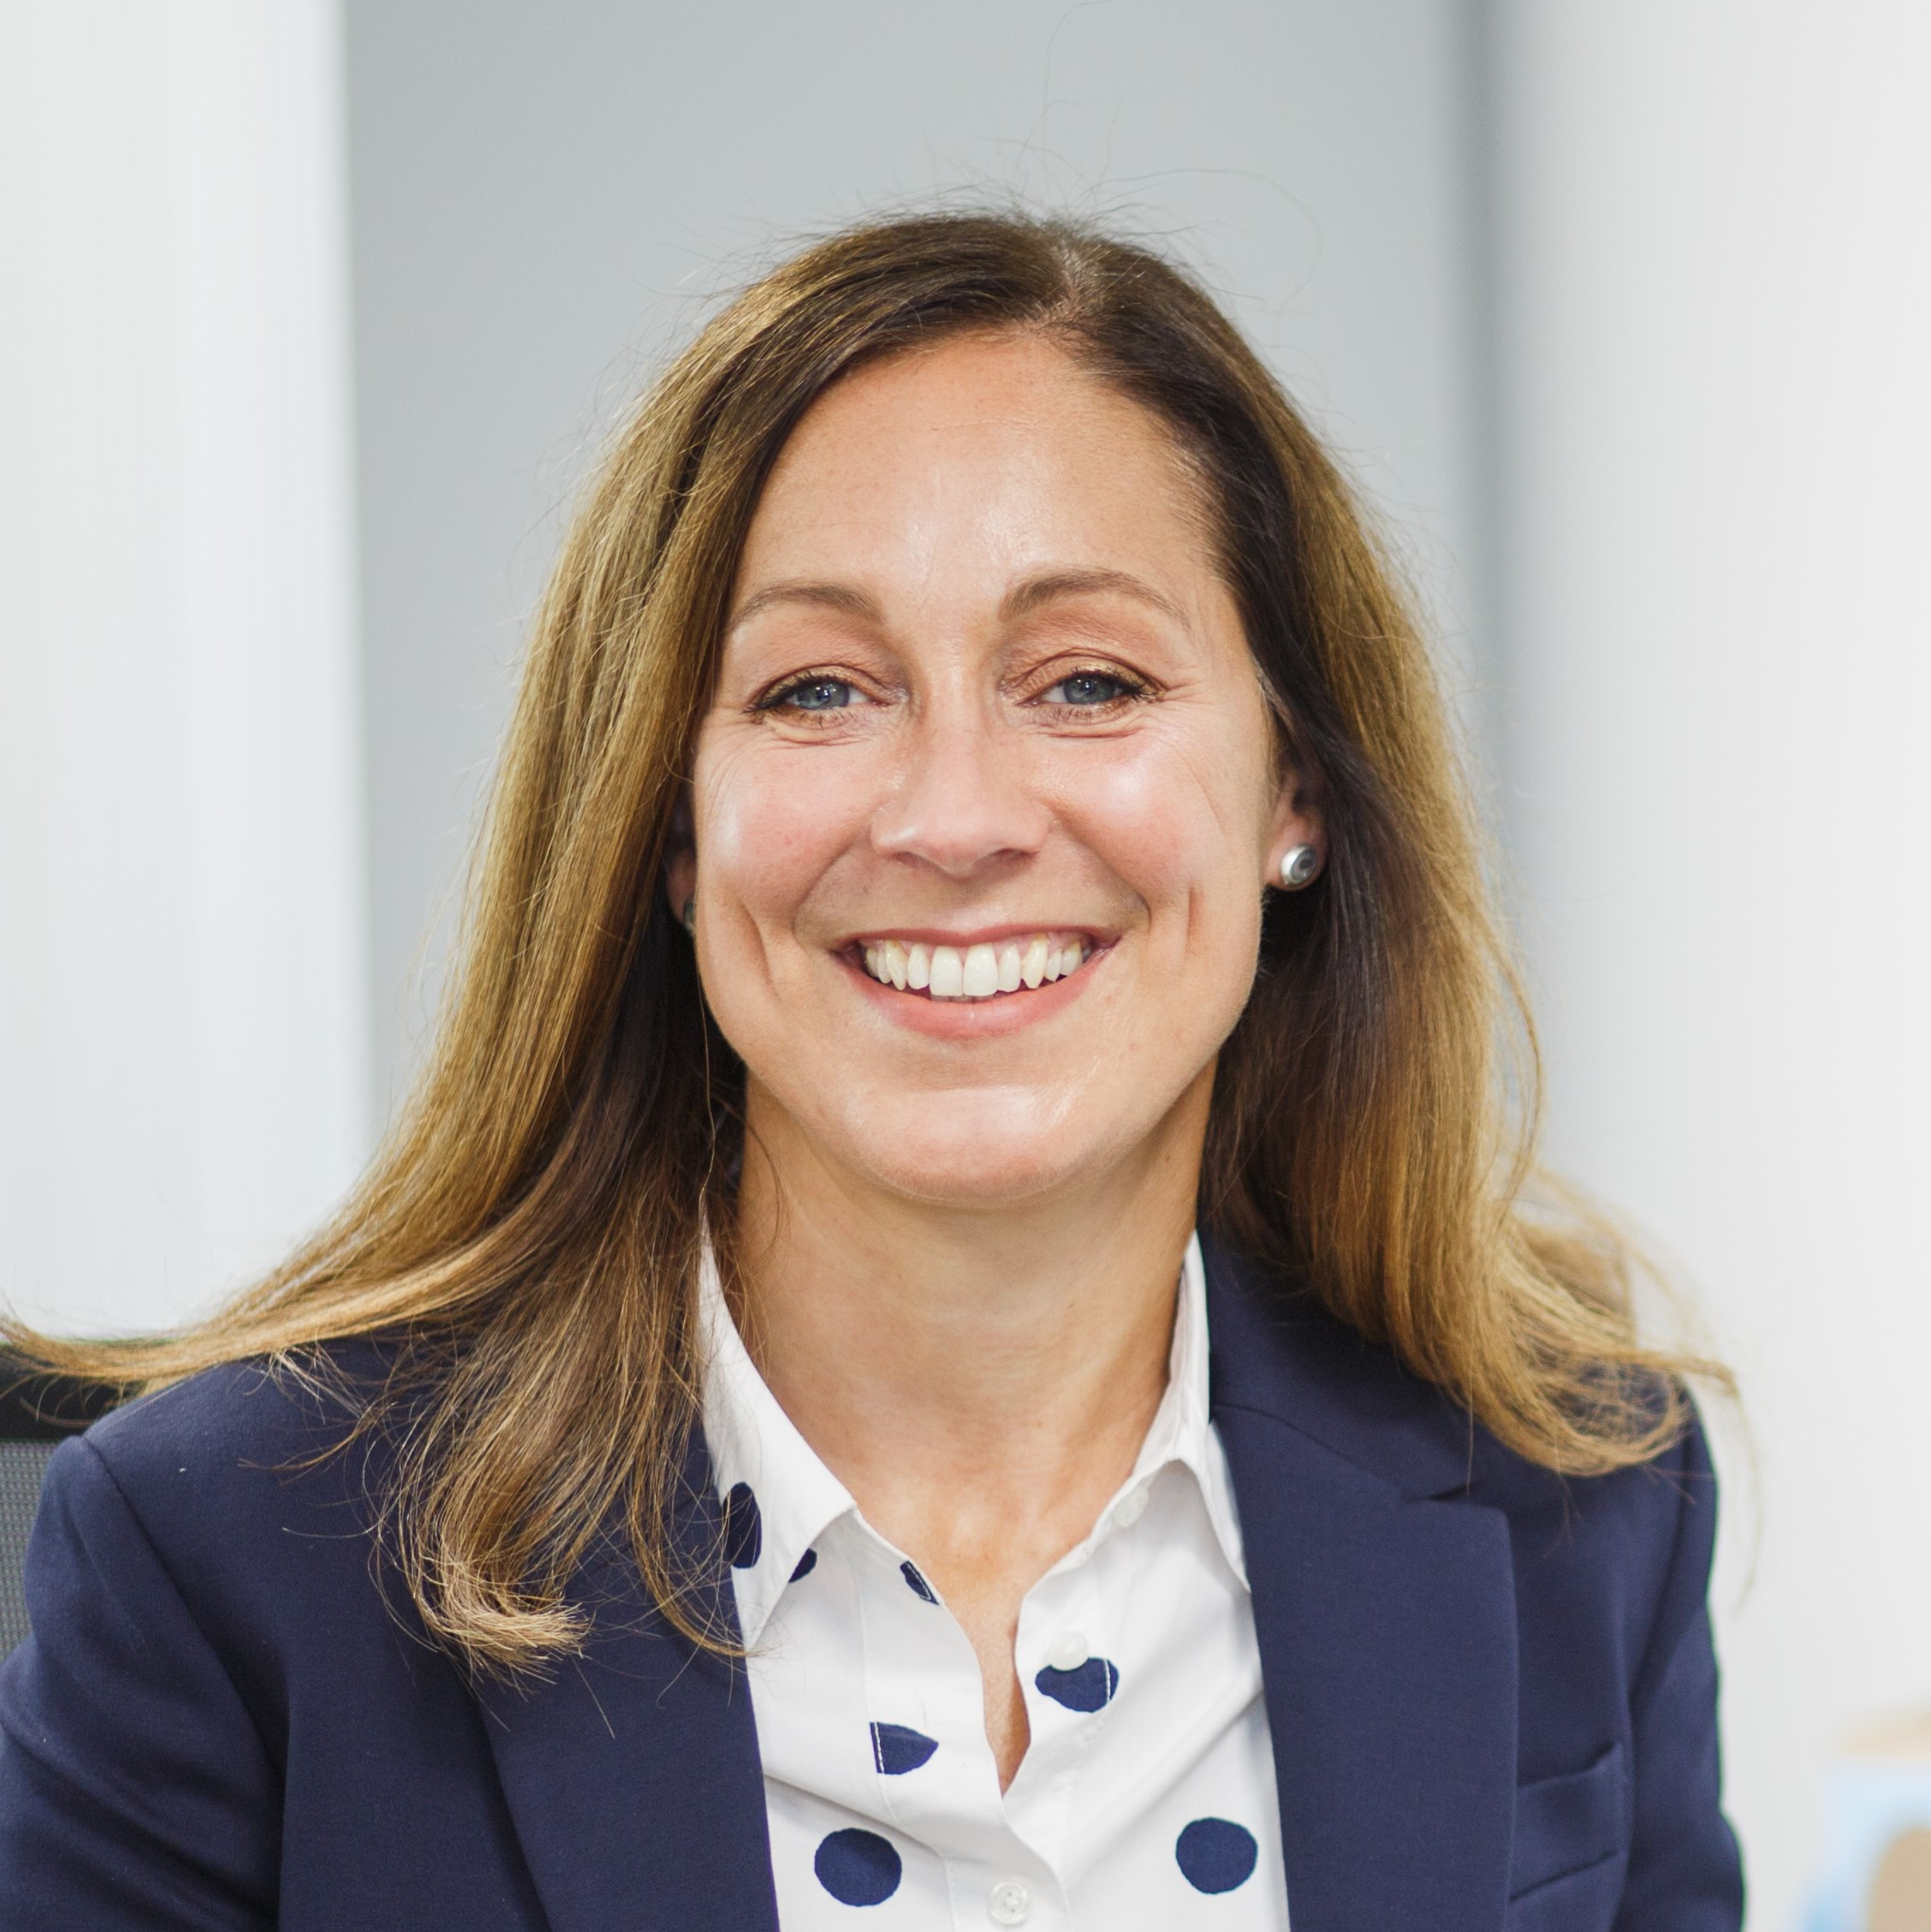 Rebecca Trivella, UK Sales Director